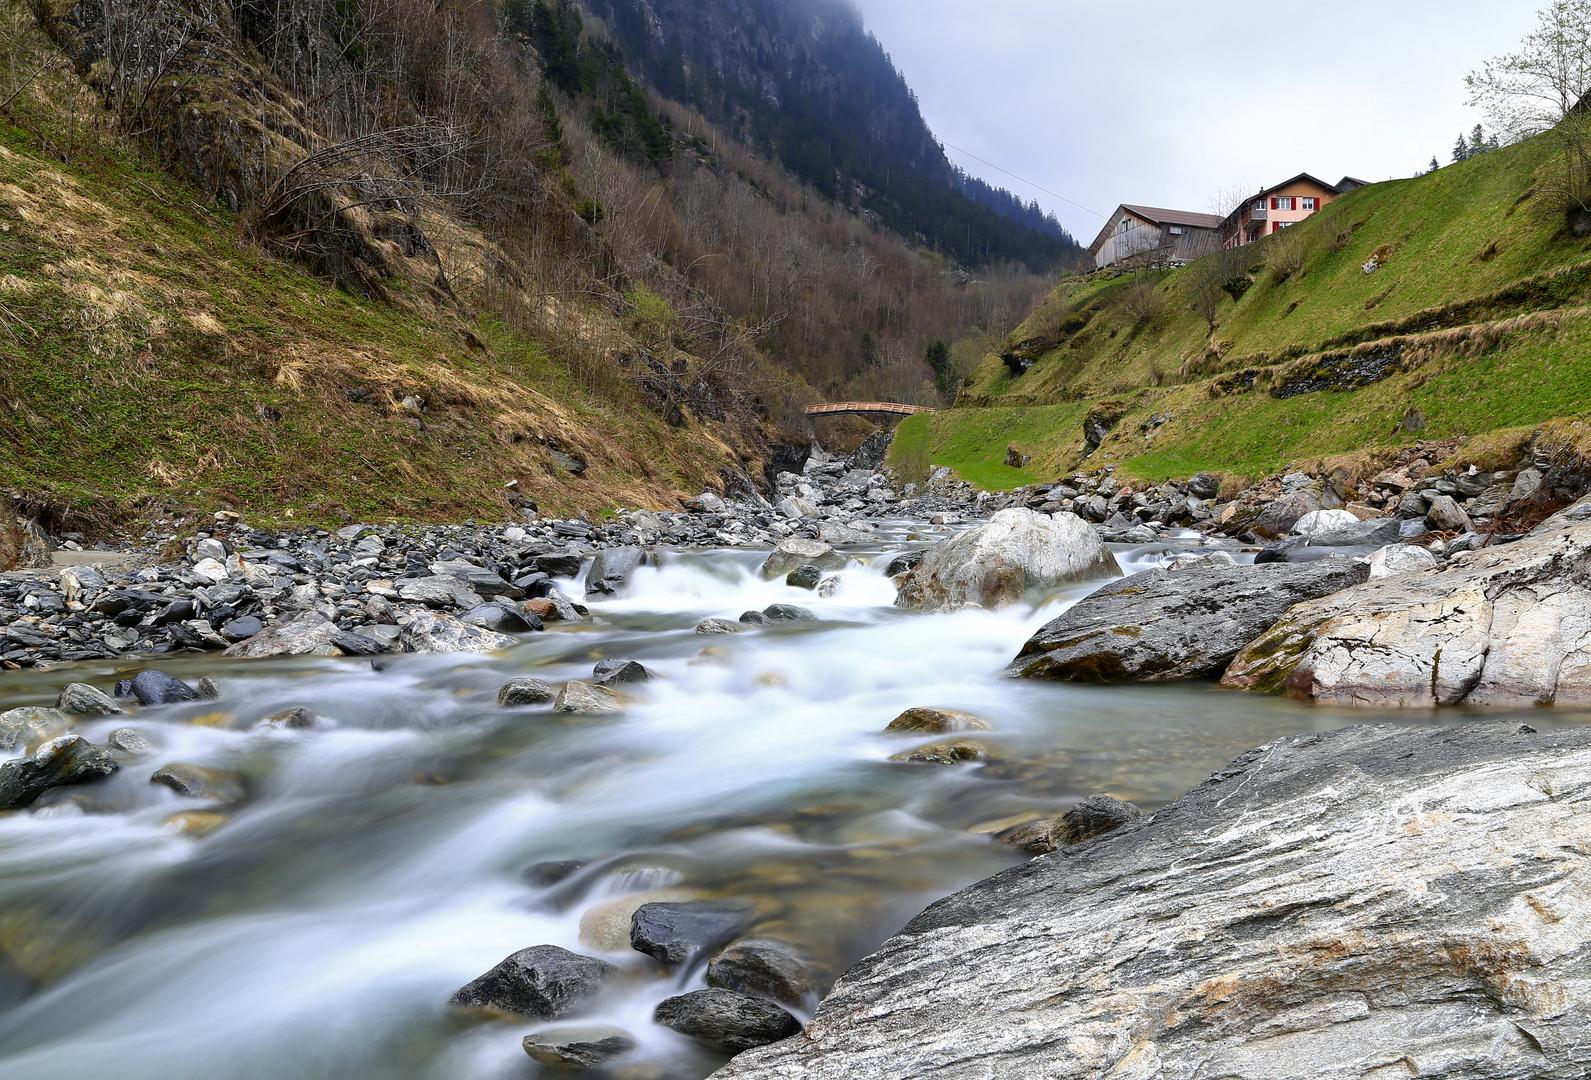 Kärstelenbach Acherli, Bristen